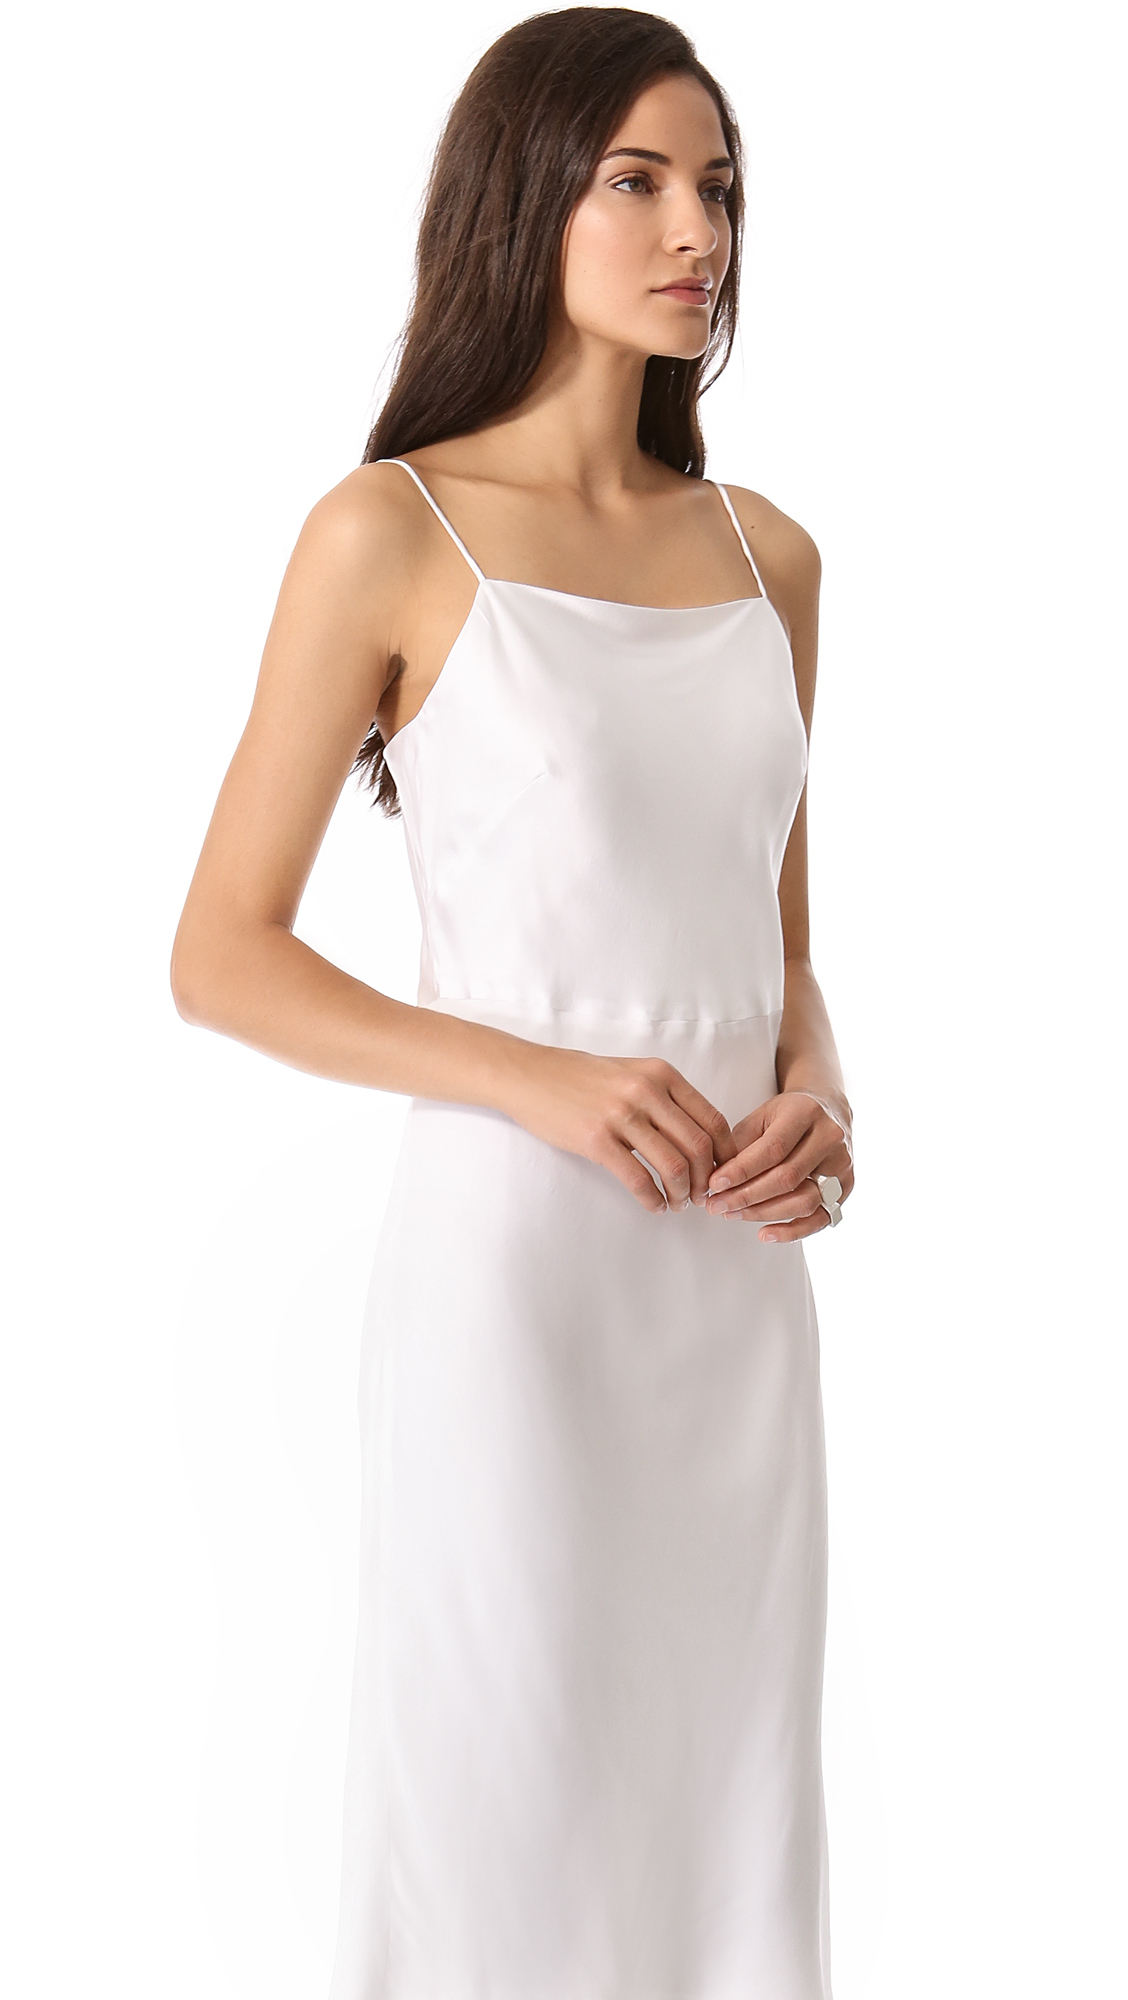 Jenni kayne Slip Dress - White in White  Lyst